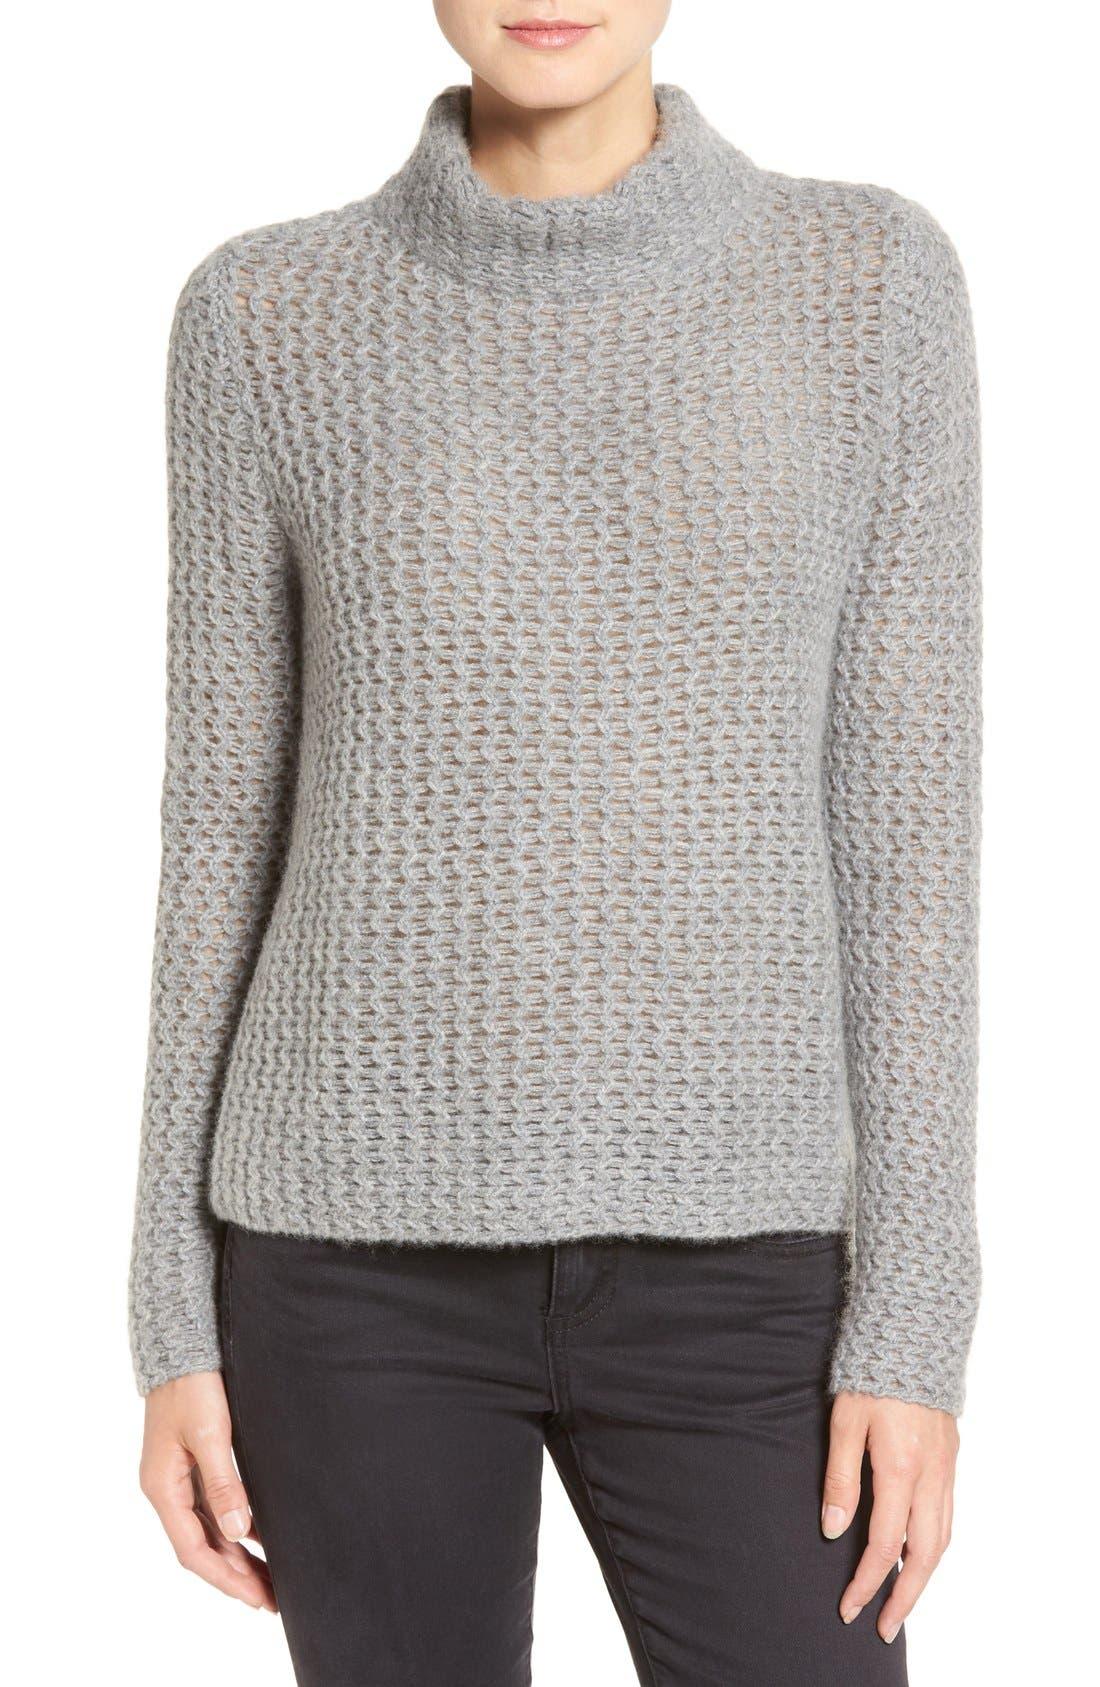 Main Image - Halogen® Stitch Detail Cashmere Mock Neck Sweater (Regular & Petite)